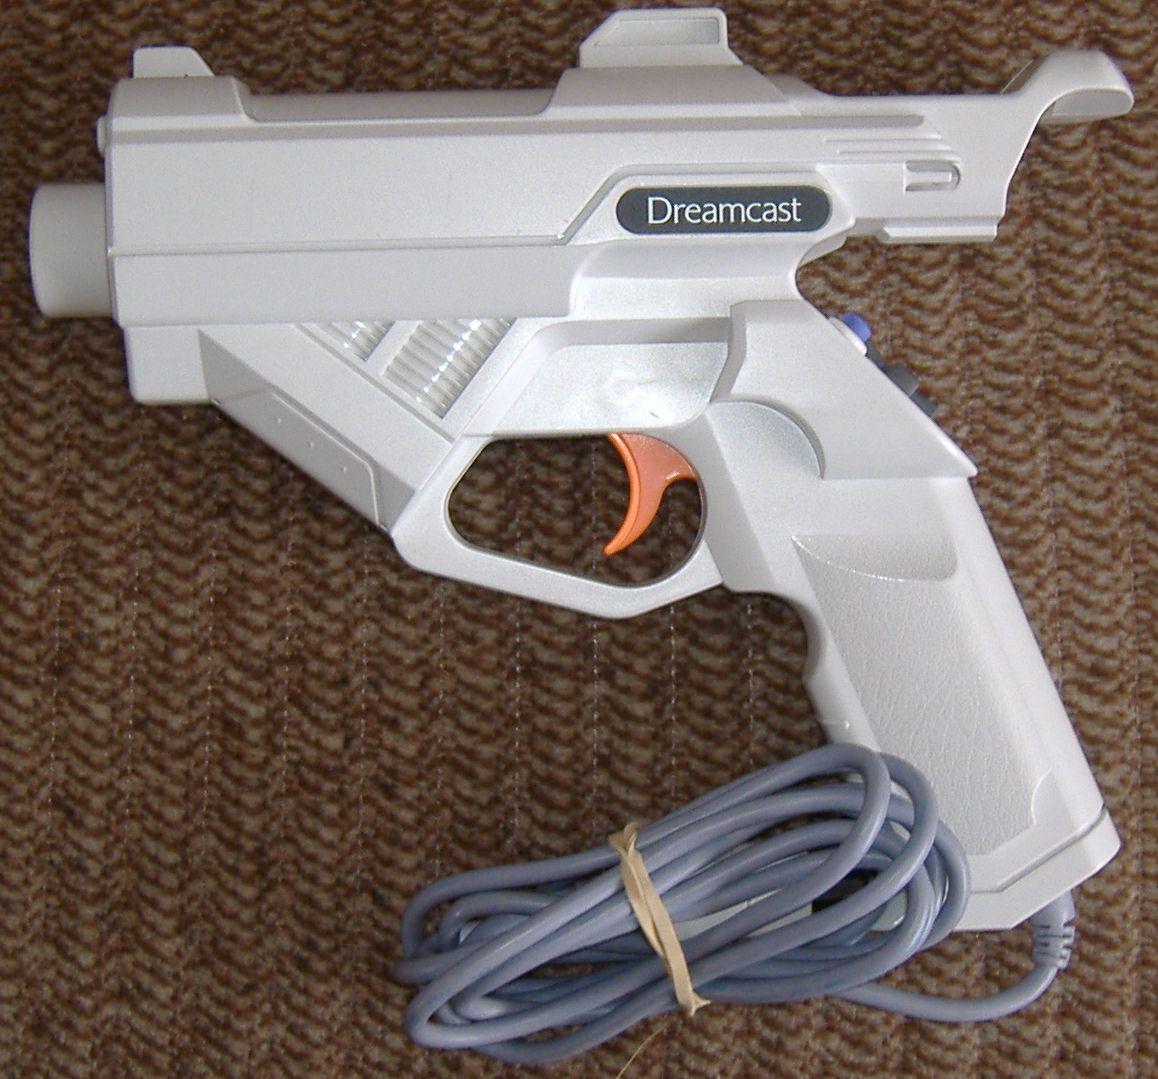 photo of a Sega Dreamcast light gun